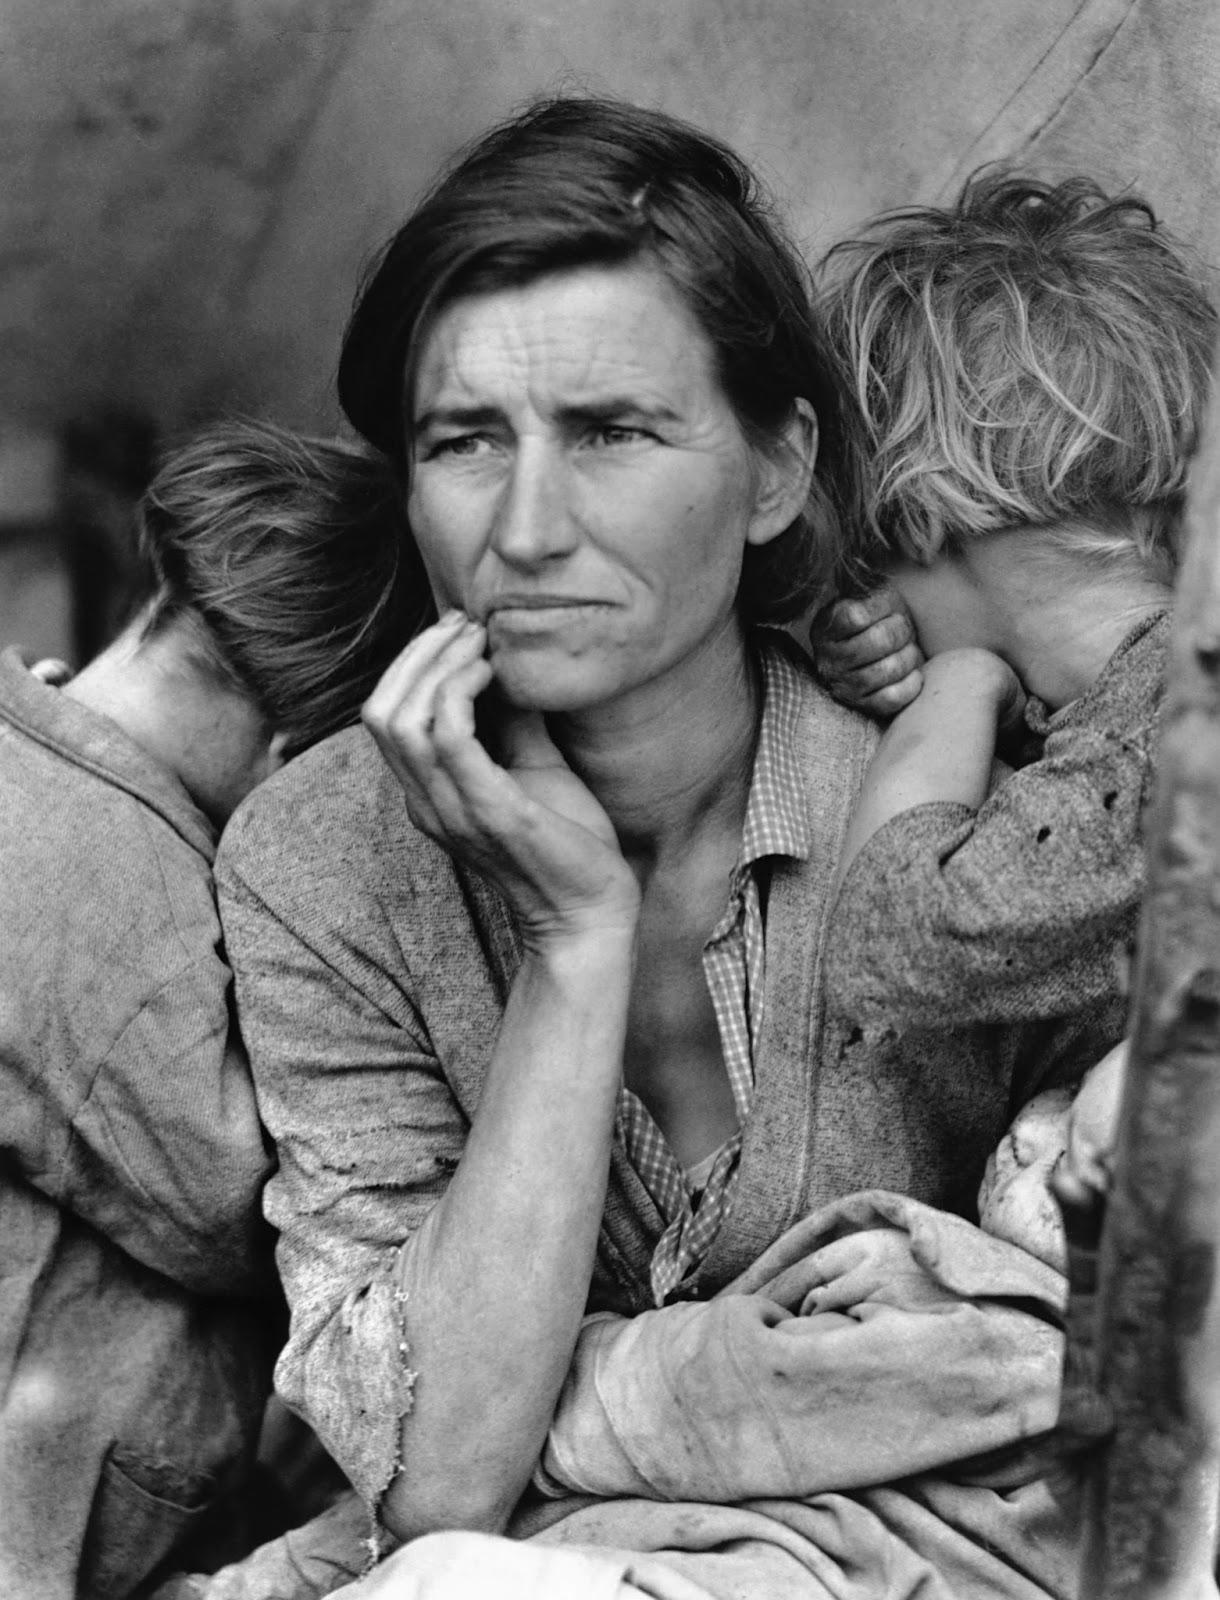 El MoMA rinde homenaje al compromiso social de la fotógrafa Dorothea Lange